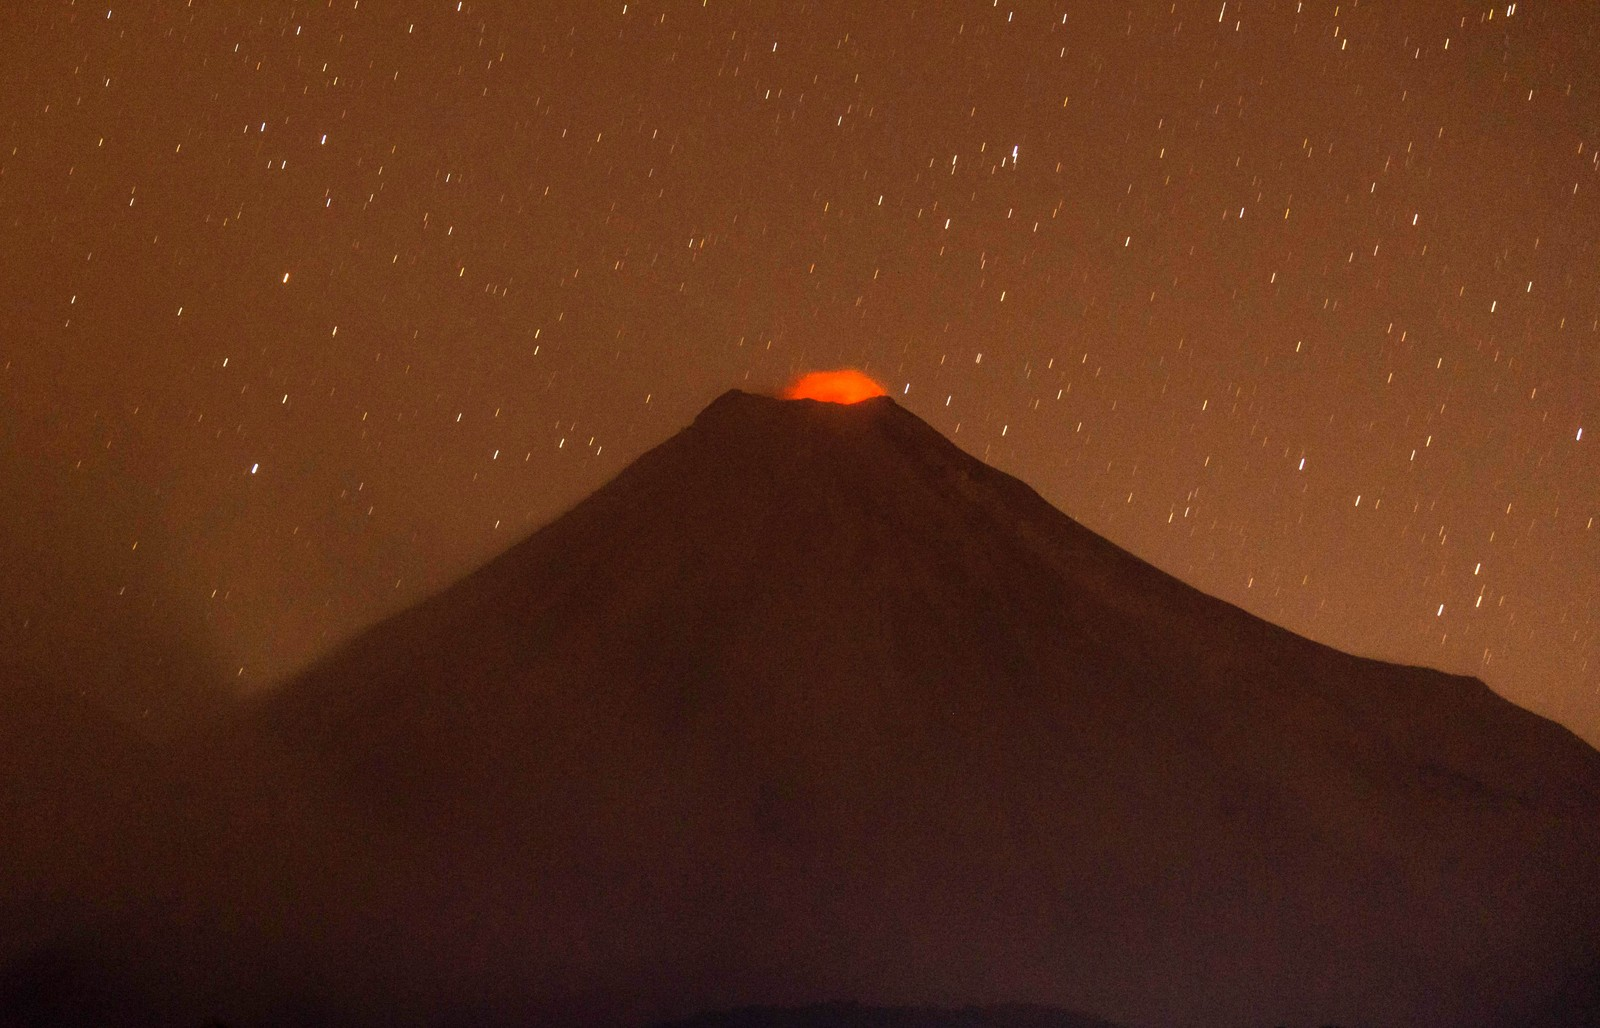 Vulkanen Colima, også kjent som volcán de fuego (ildvulkanen), er den mest aktive vulkanen i Mexico.